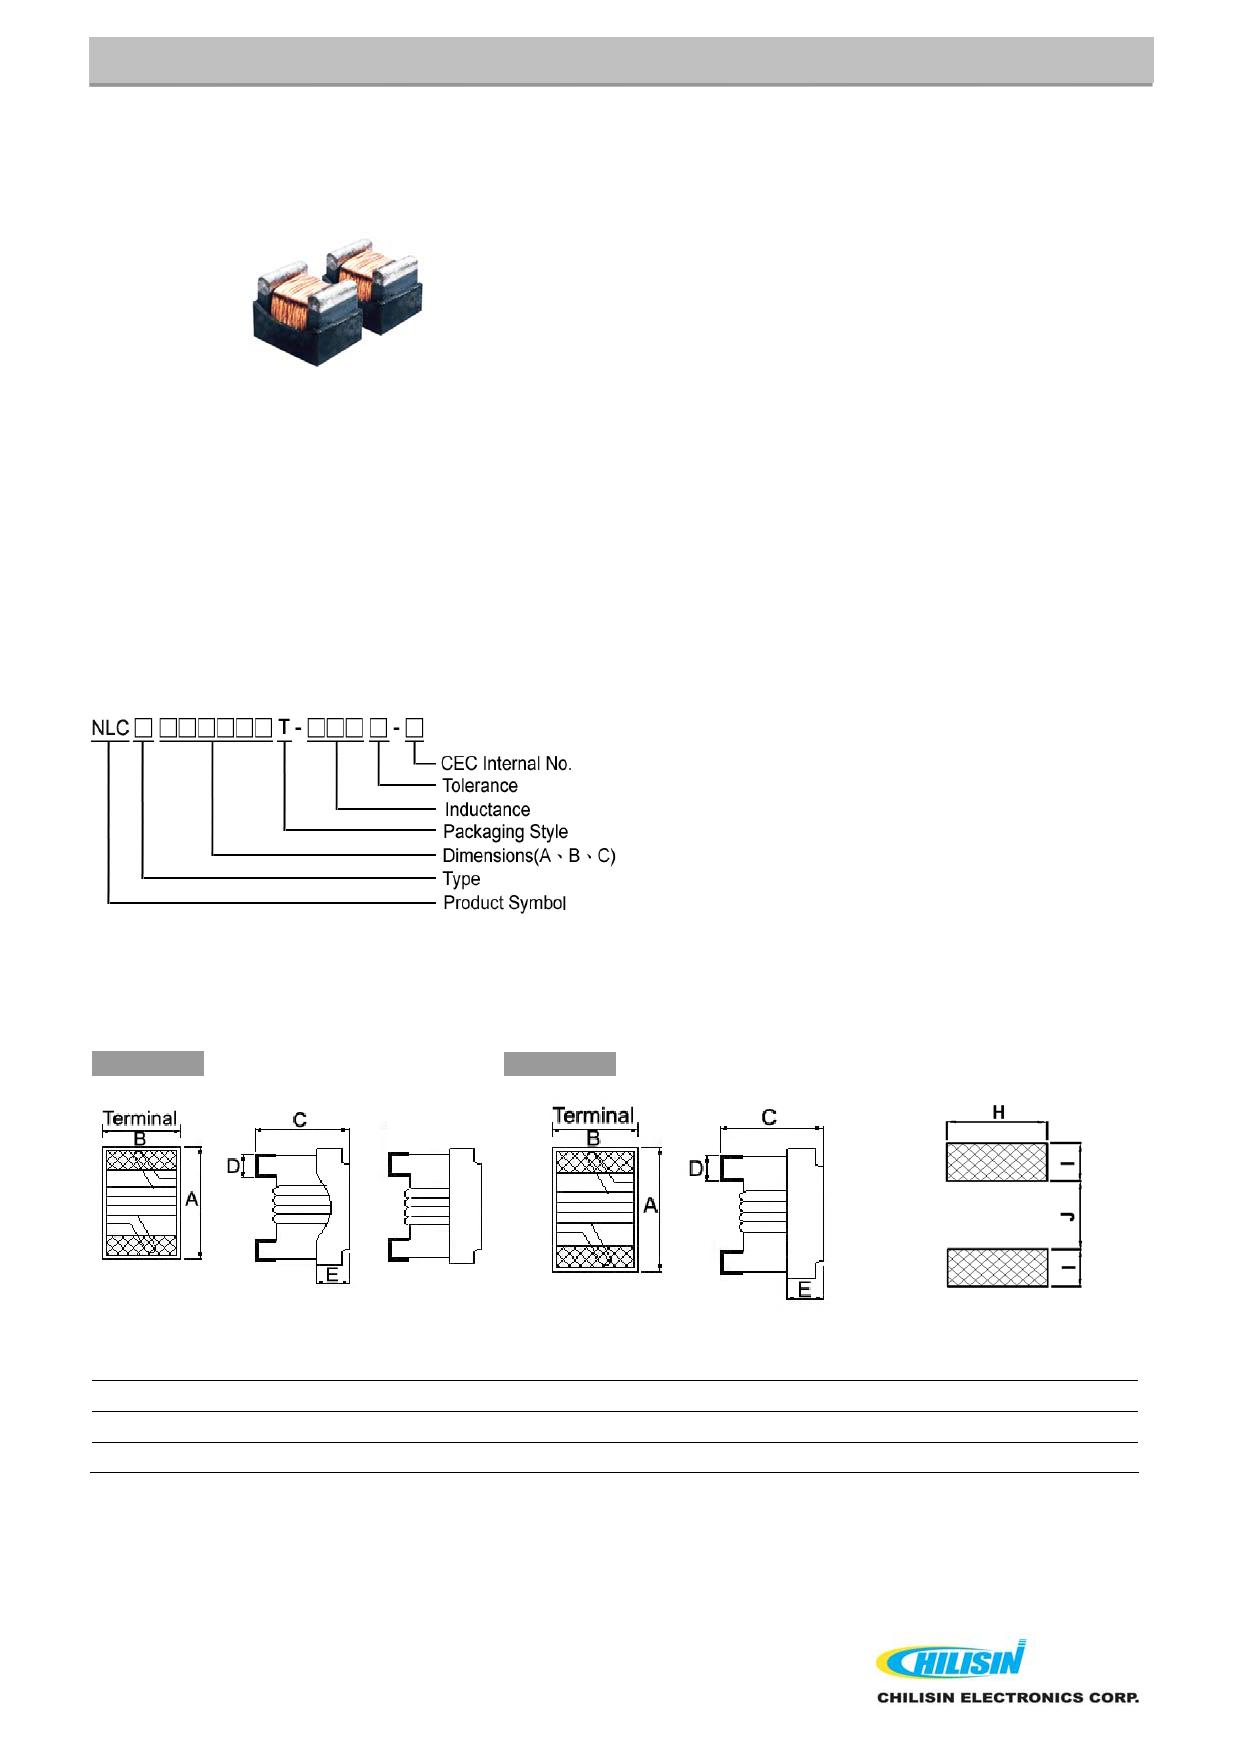 NLC252018T 데이터시트 및 NLC252018T PDF